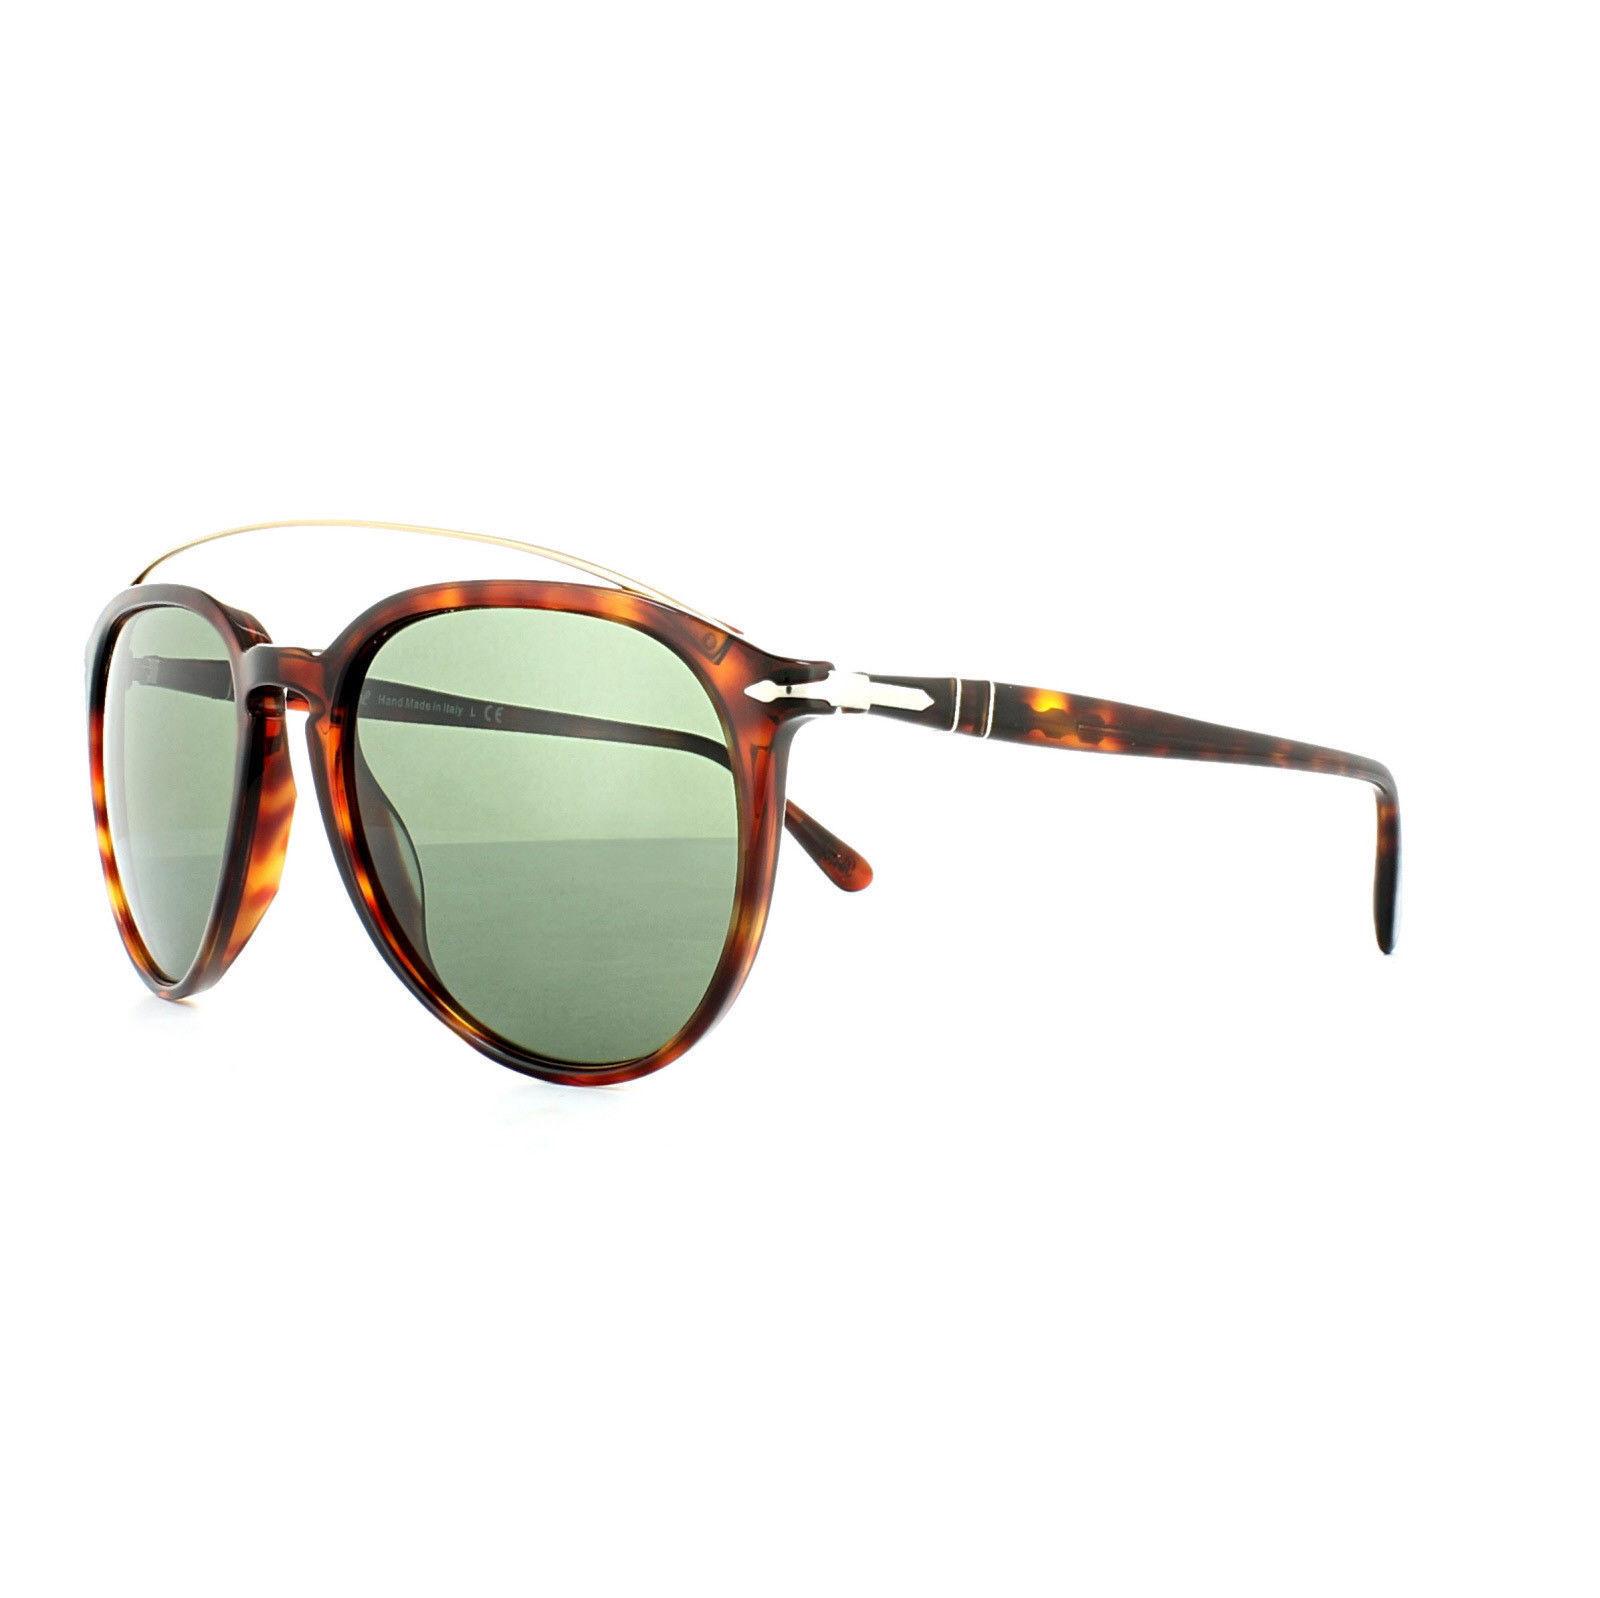 42c3ecad8e348 Persol Sunglasses PO3159 9015 31 55MM Havana Frame Green Lens -  138.59